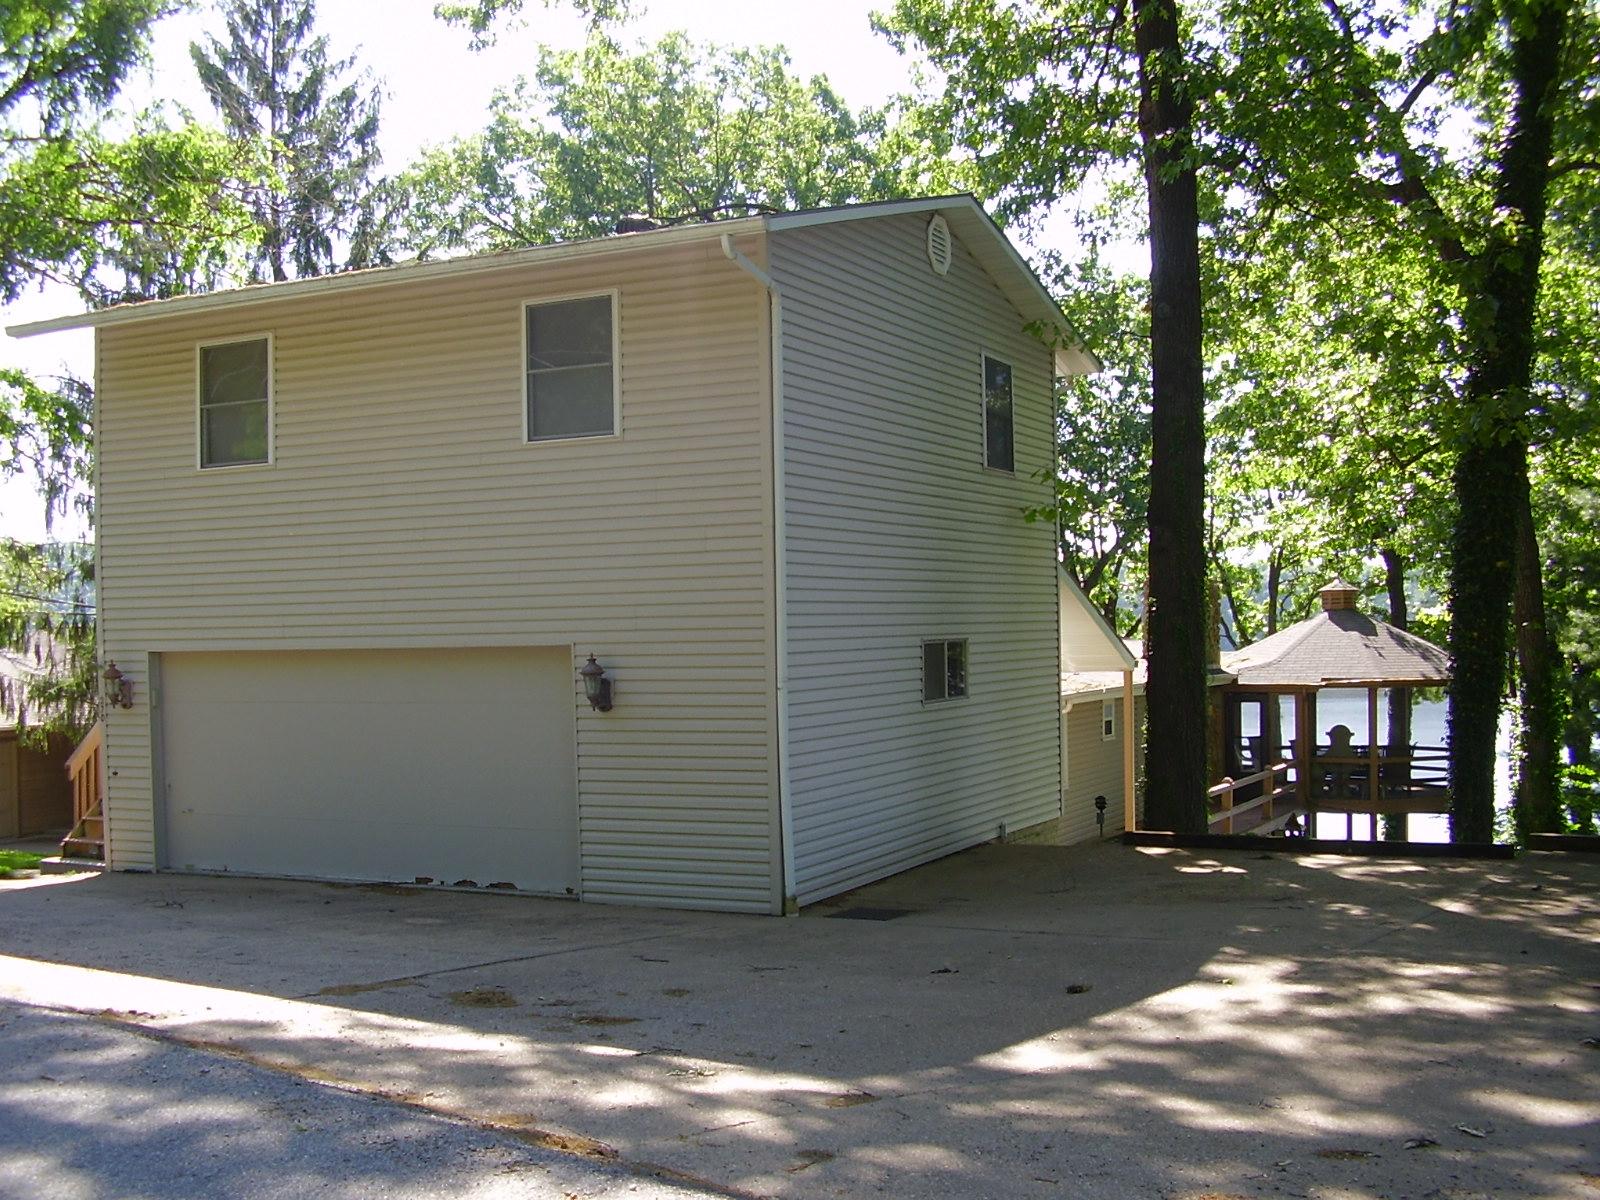 370 Ponderosa, Camdenton, Missouri 65020